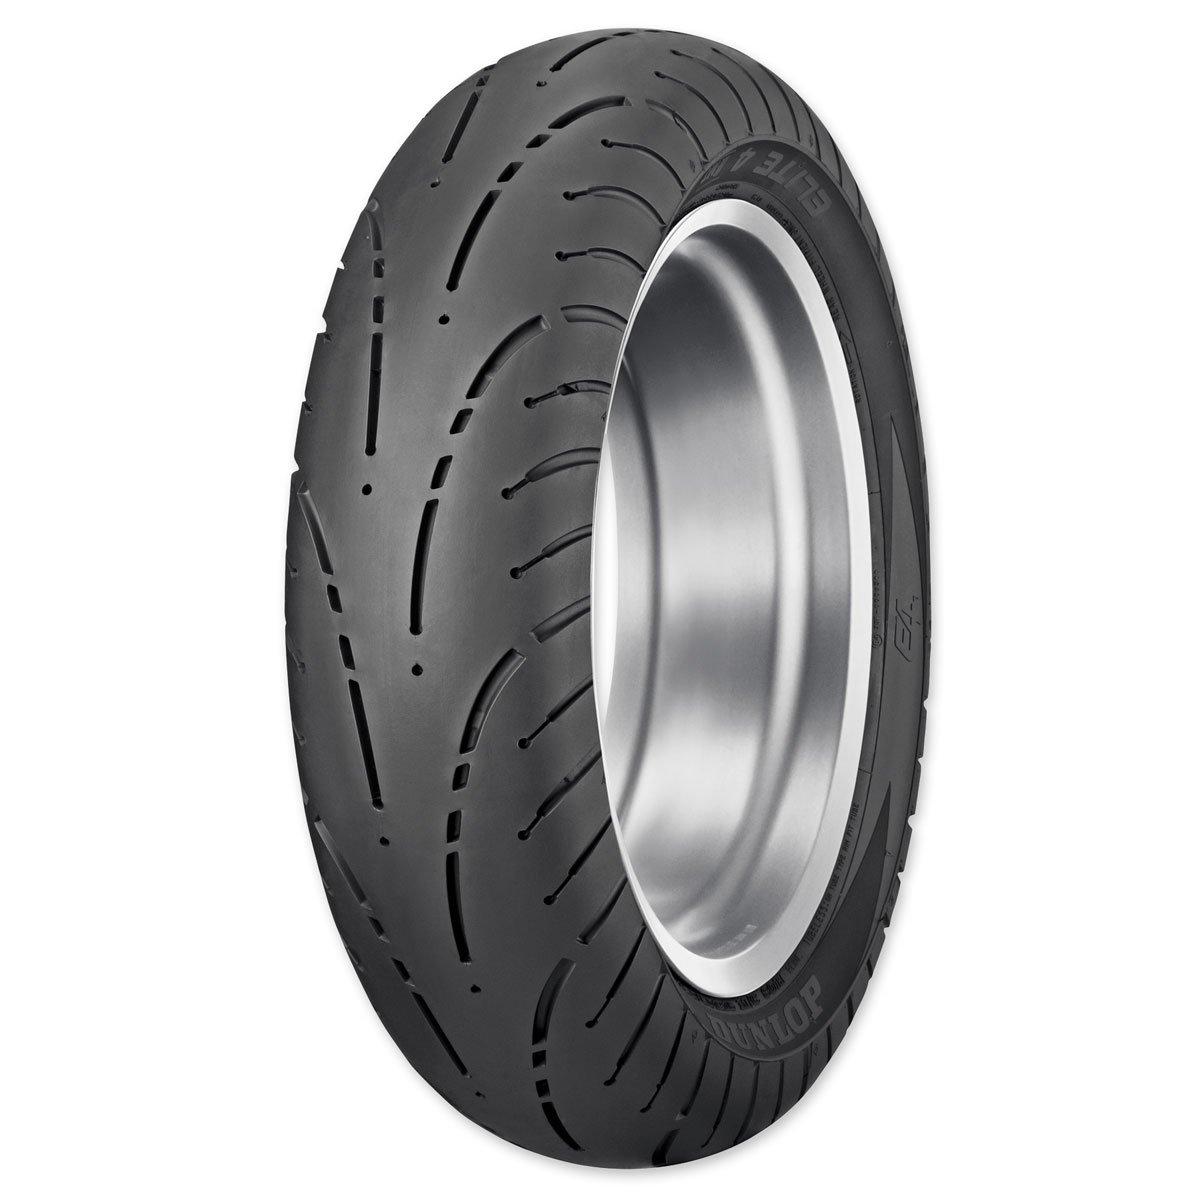 Dunlop Elite 4 - Radial - 180/60R16 by Elite 4   B01HSGS9ZQ